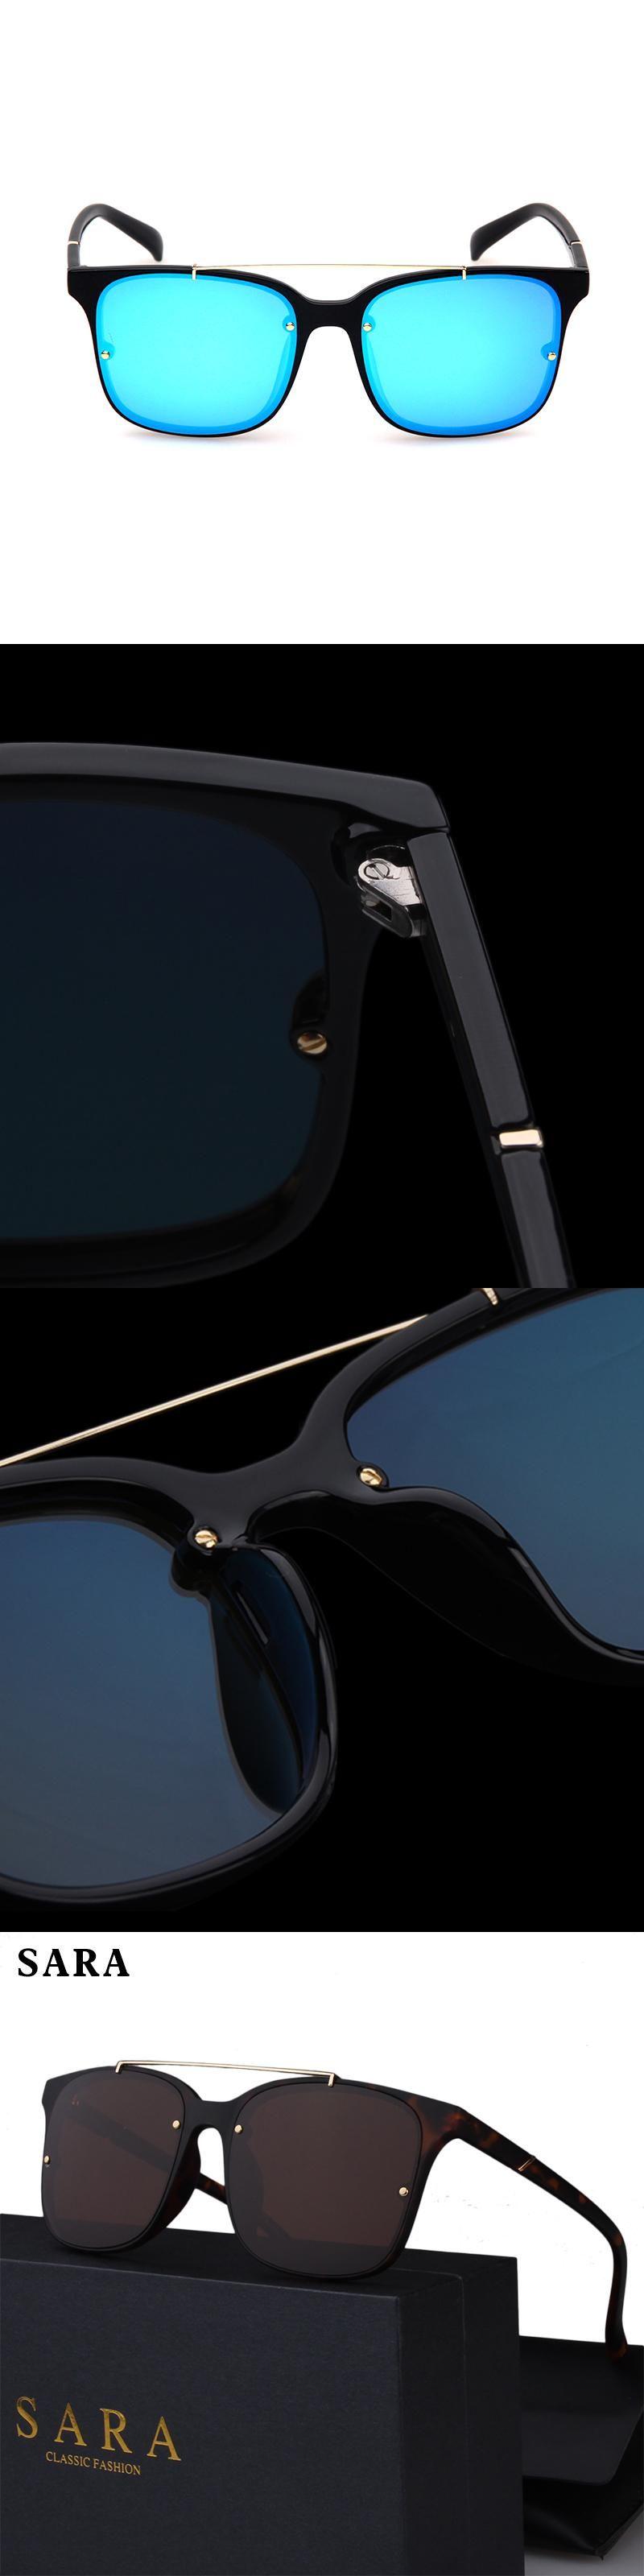 dd50c3286c51c 2017 SARA Retro Square Men s Polarized Sunglasses Men Classic Brand Designer  Driving Eyewear TR90 Frames Sun